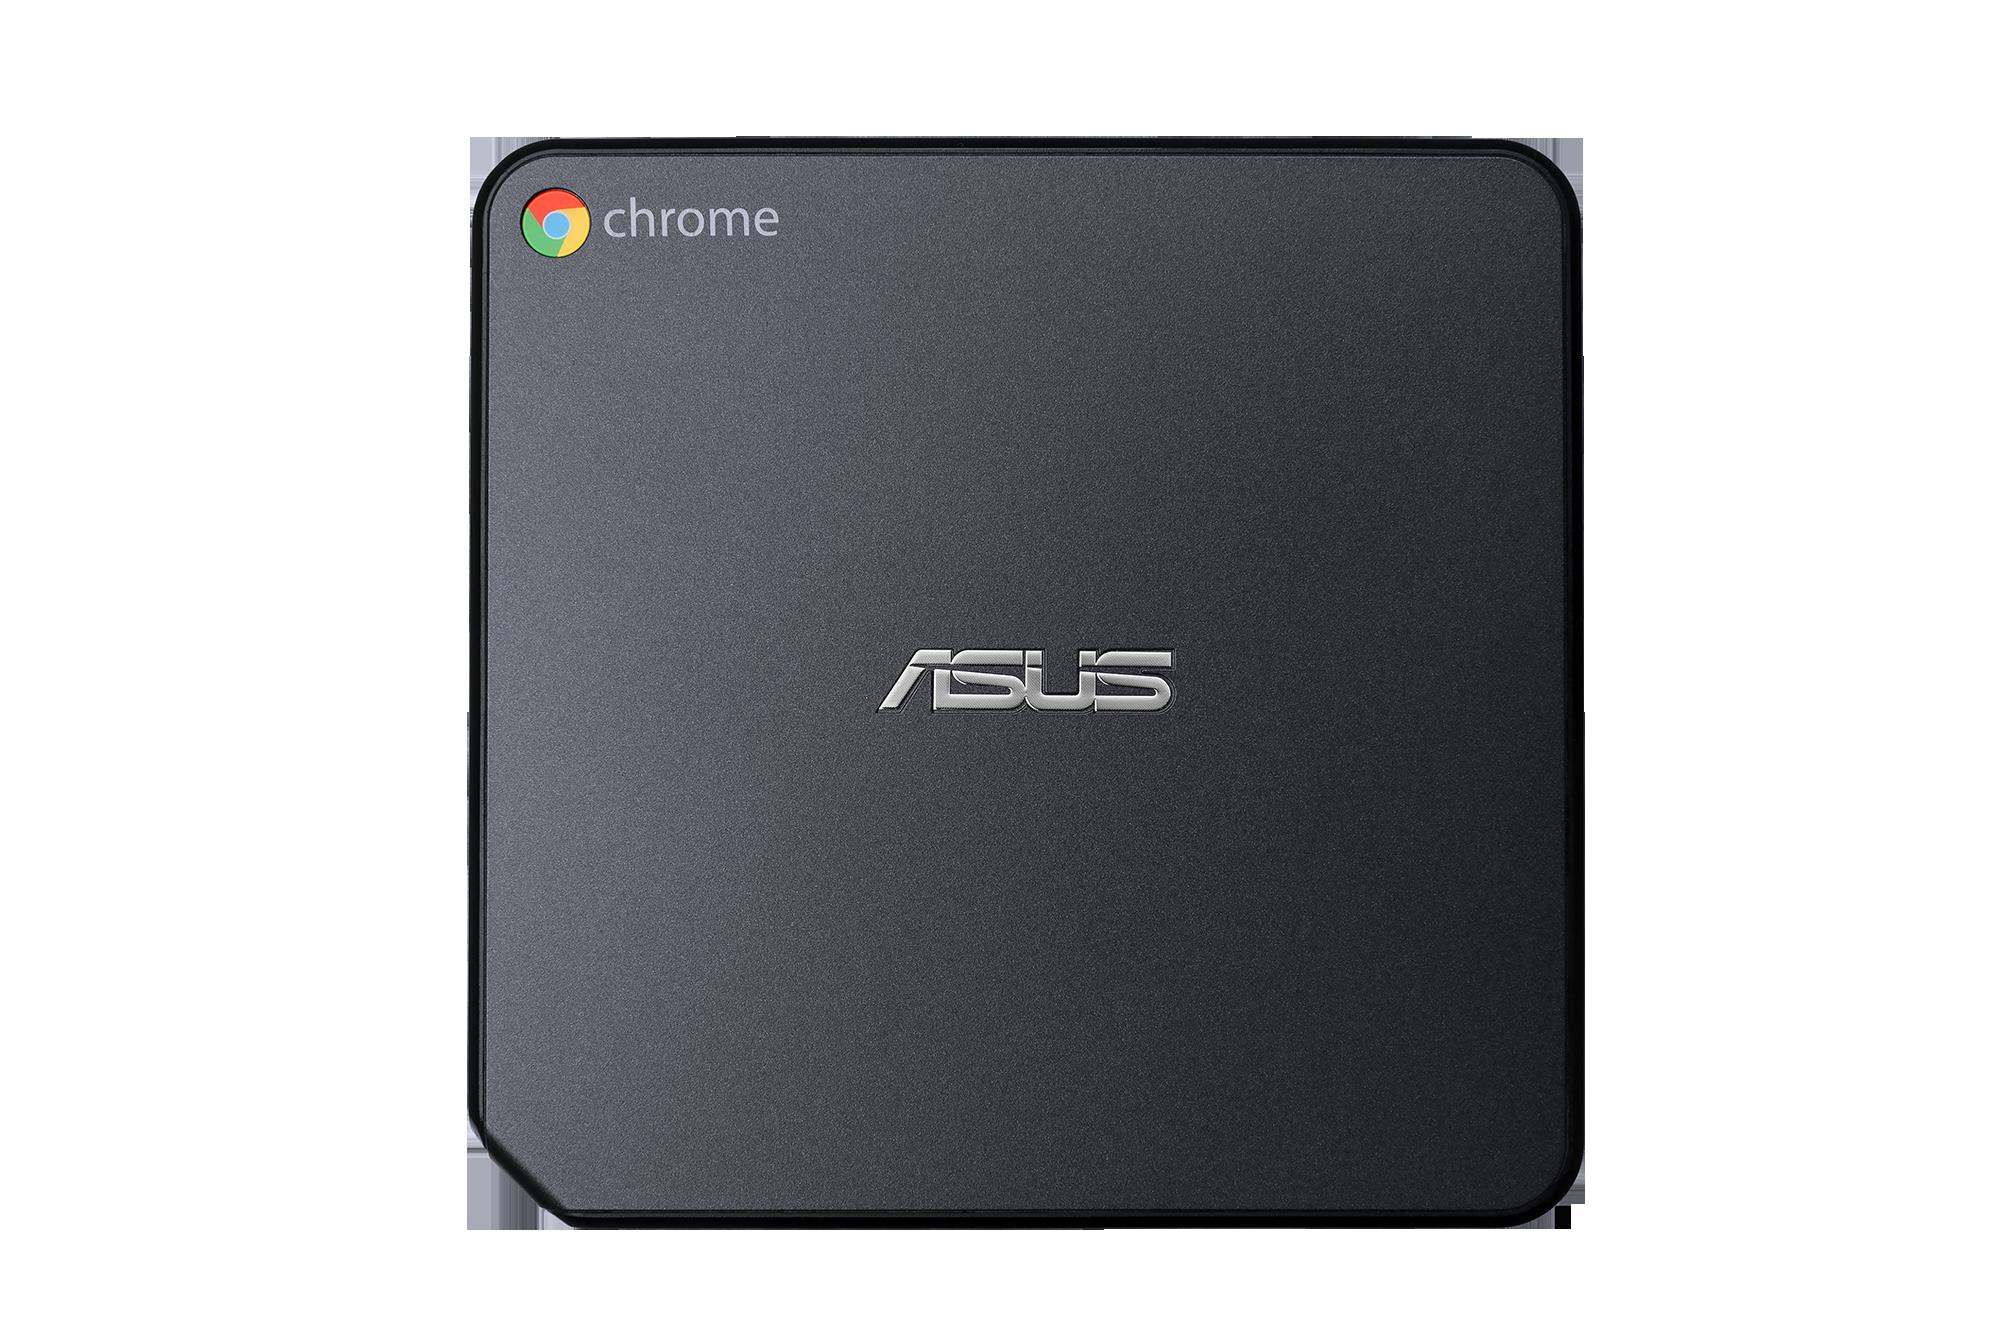 ASUS CHROMEBOX 2 - 3215U/16GB/2GB/CHOS šedý